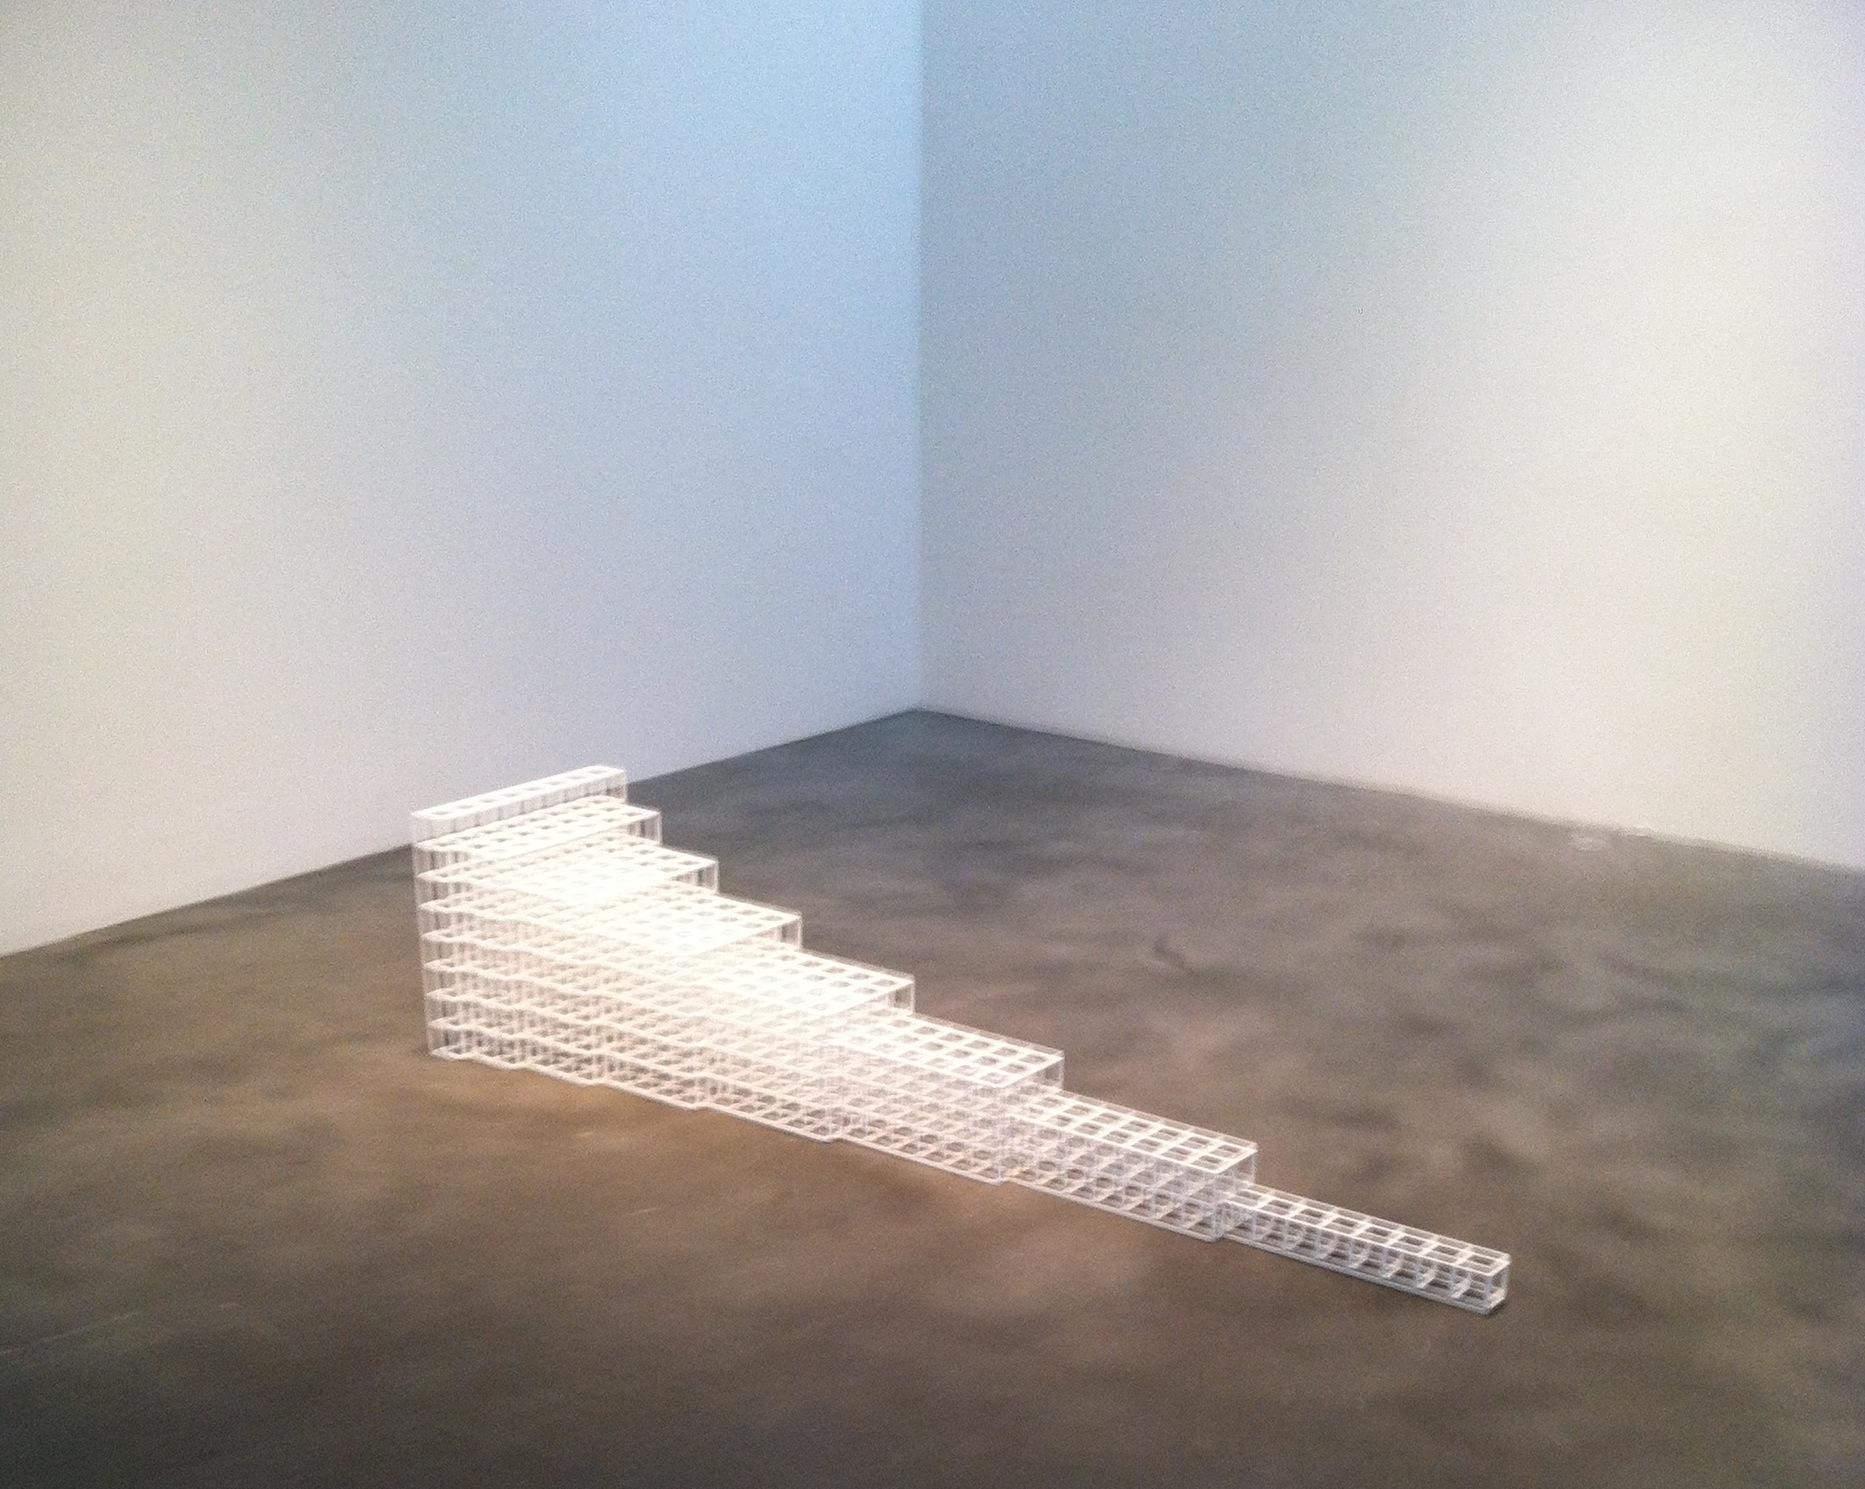 New york sol lewitt at pace gallery now through for Sol lewitt art minimal